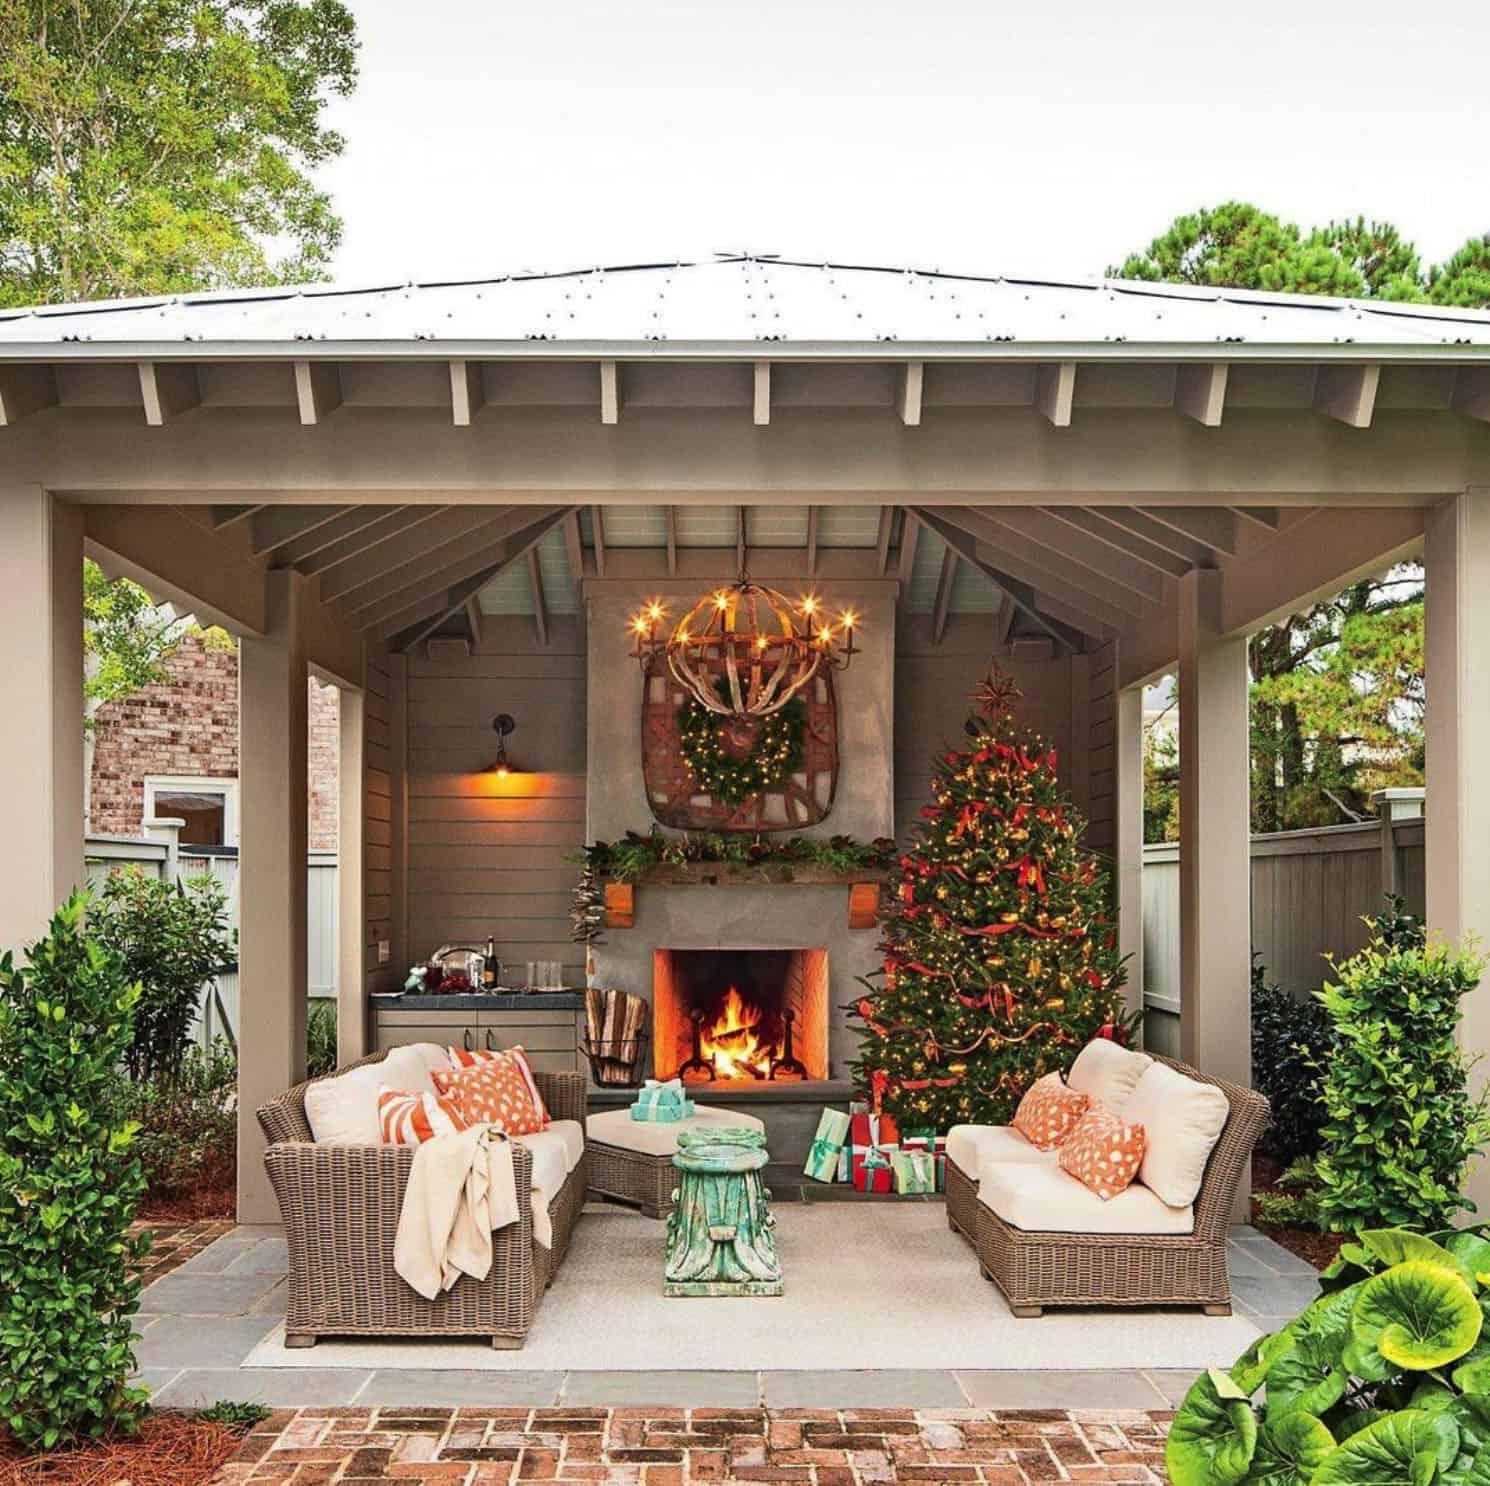 holiday-decor-ideas-outdoor-living-patio